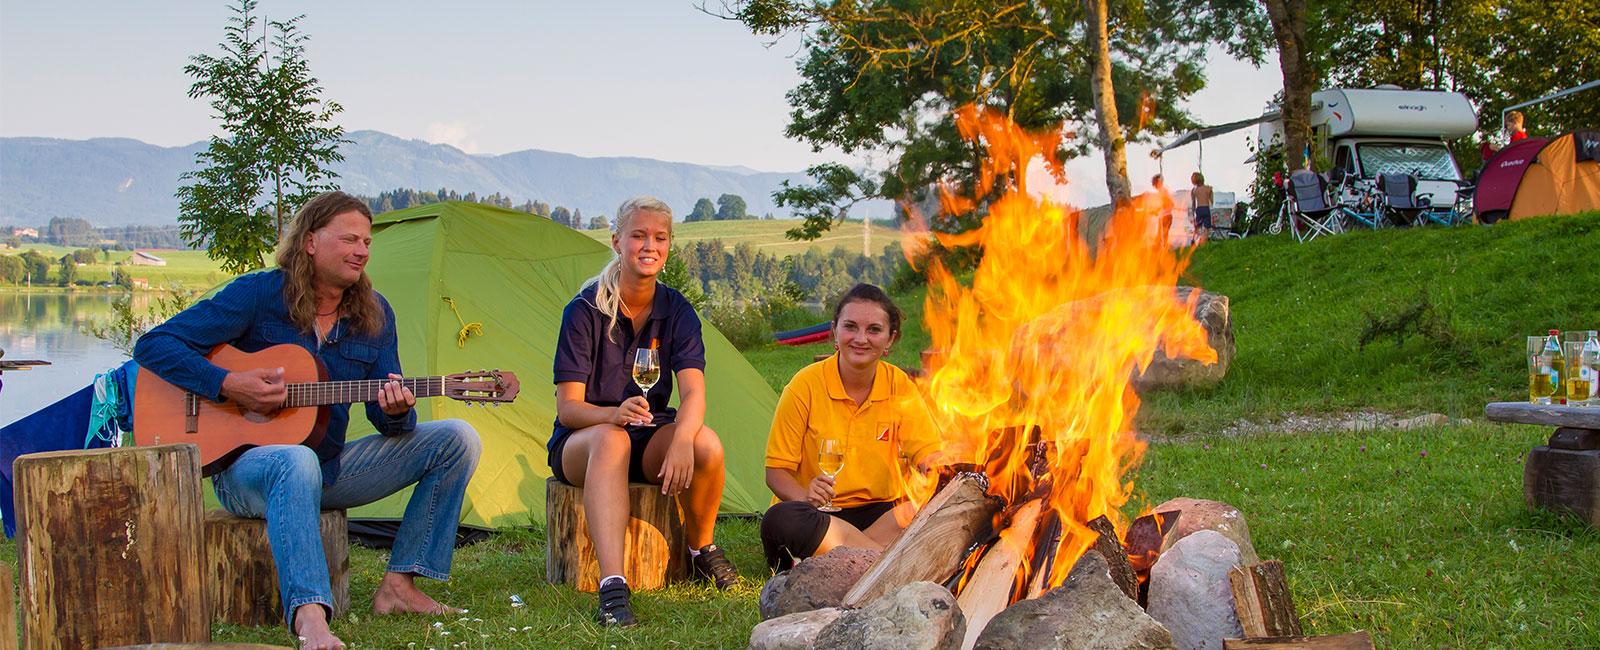 Lagerfeuer am Campingplatz